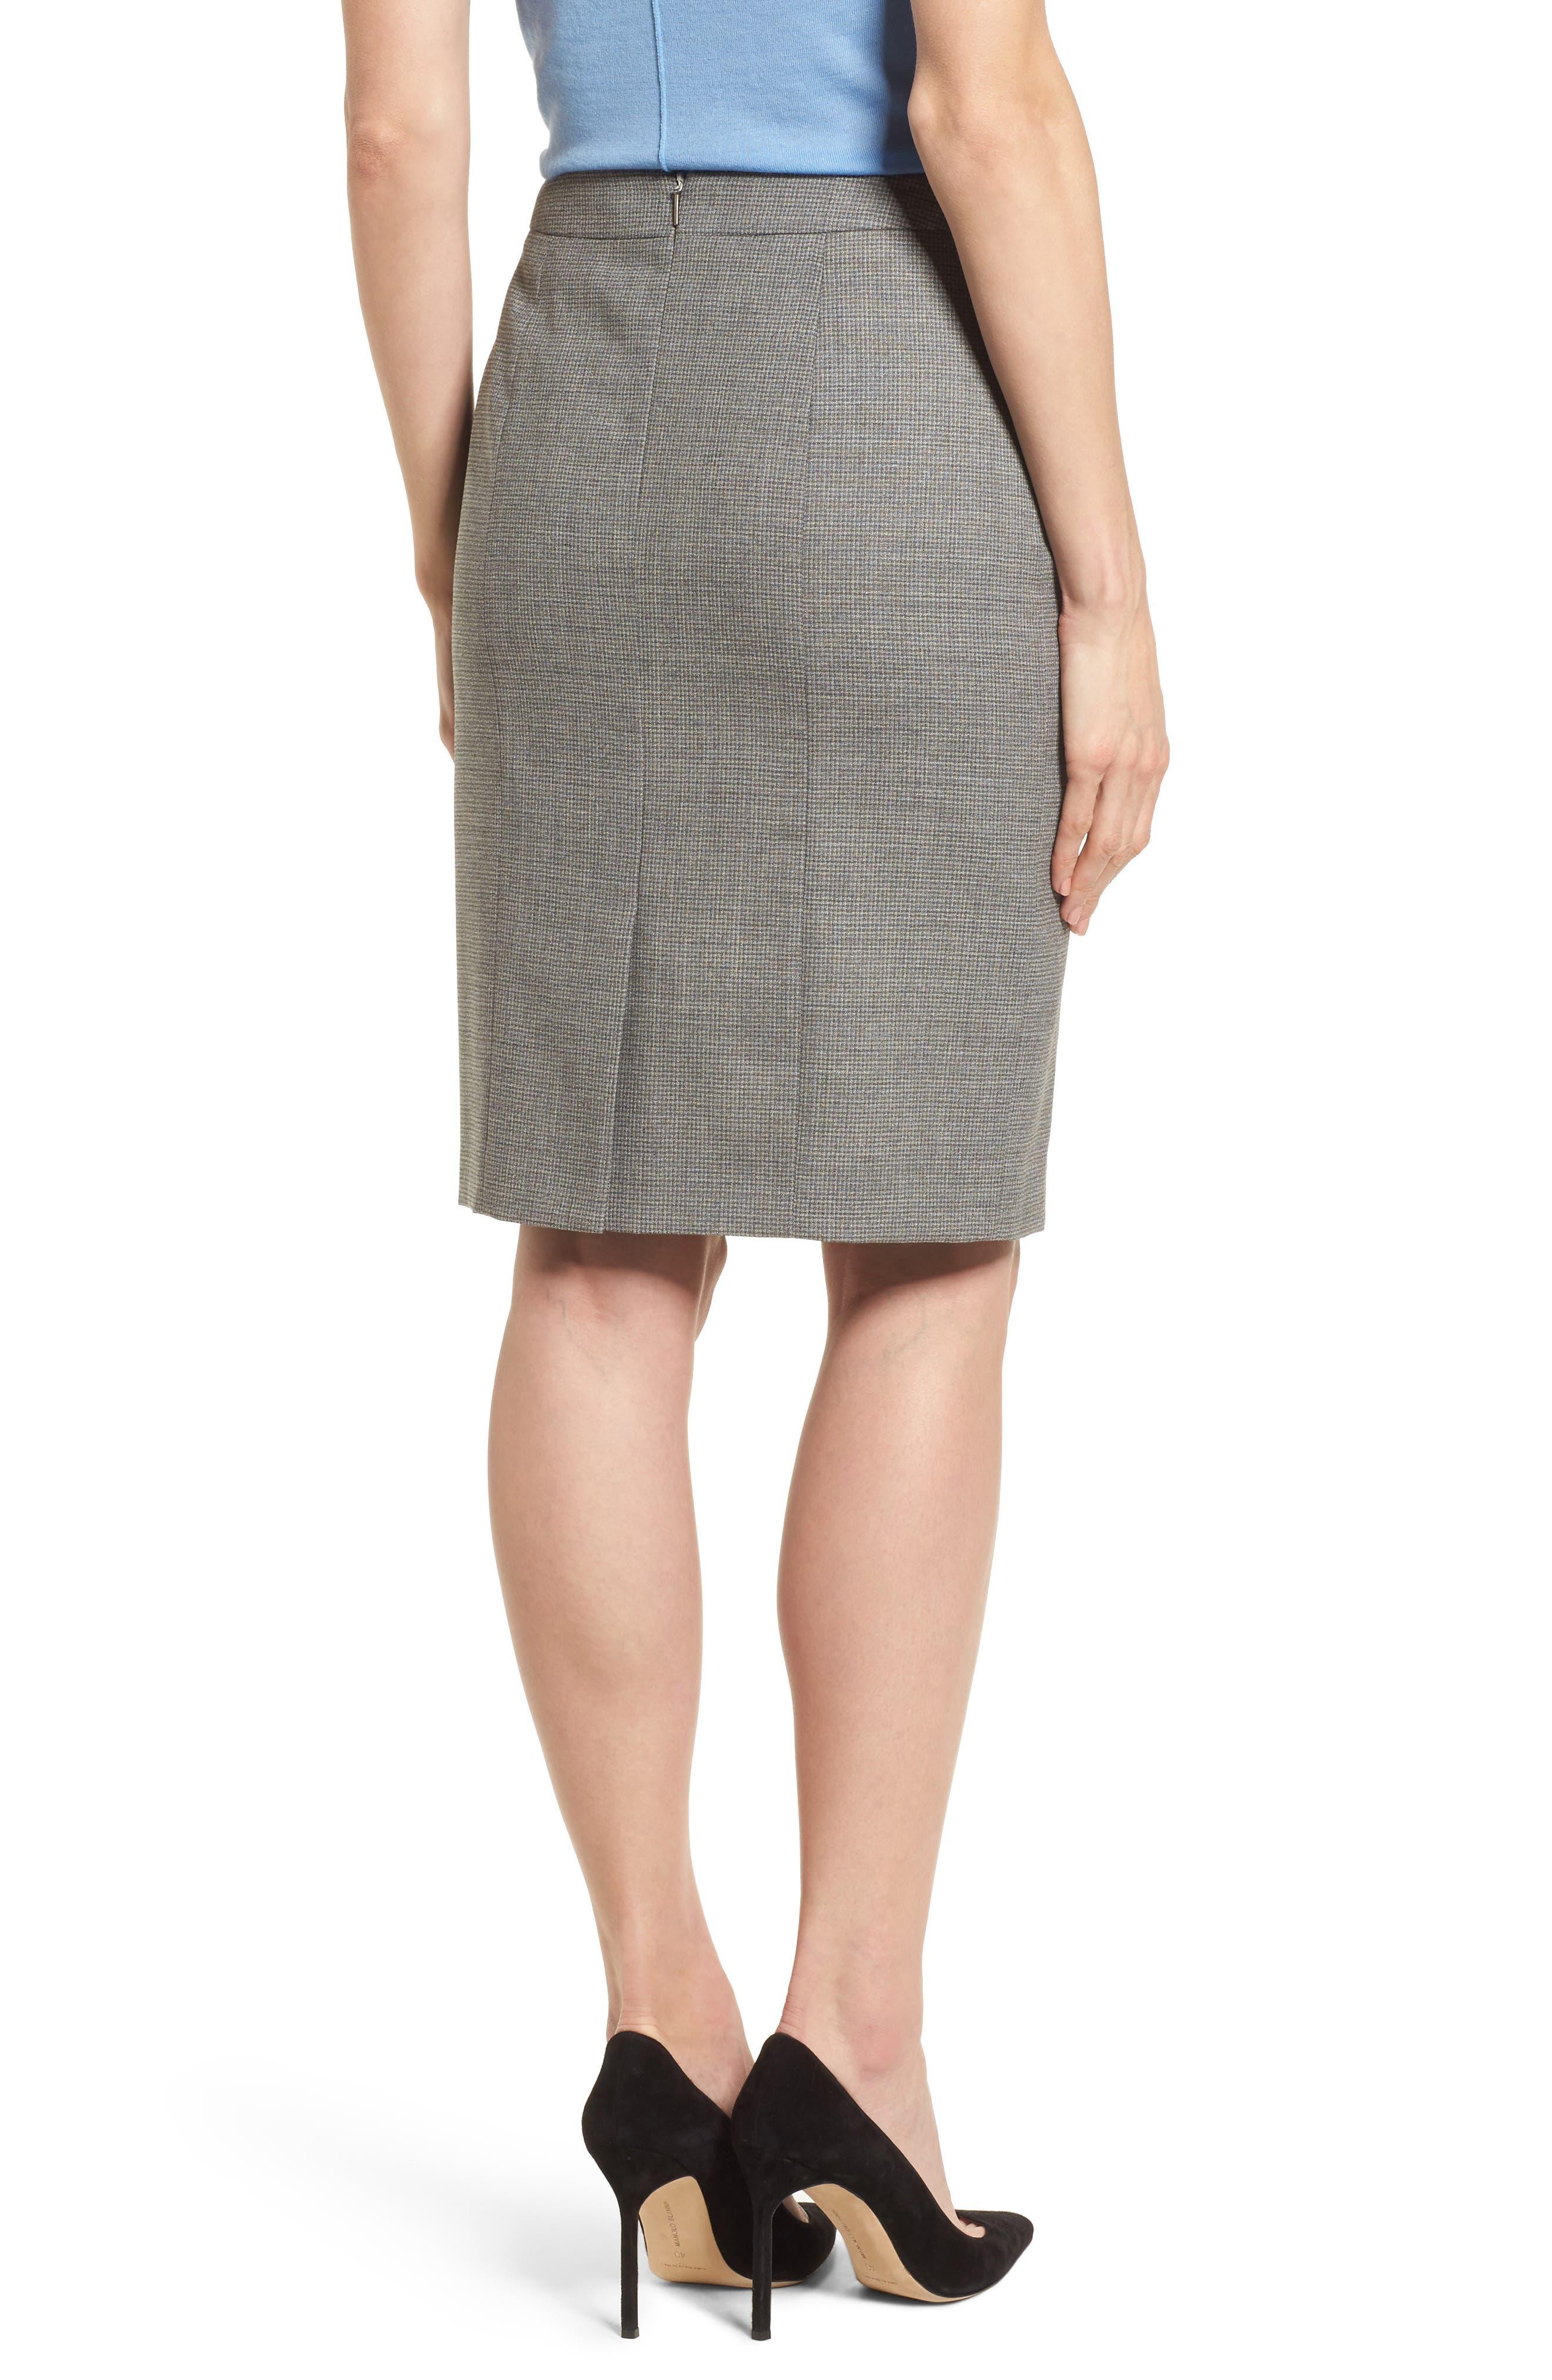 Vewisa Check Wool Suit Skirt,                             Alternate thumbnail 2, color,                             Cozy Grey Melange Fantasy